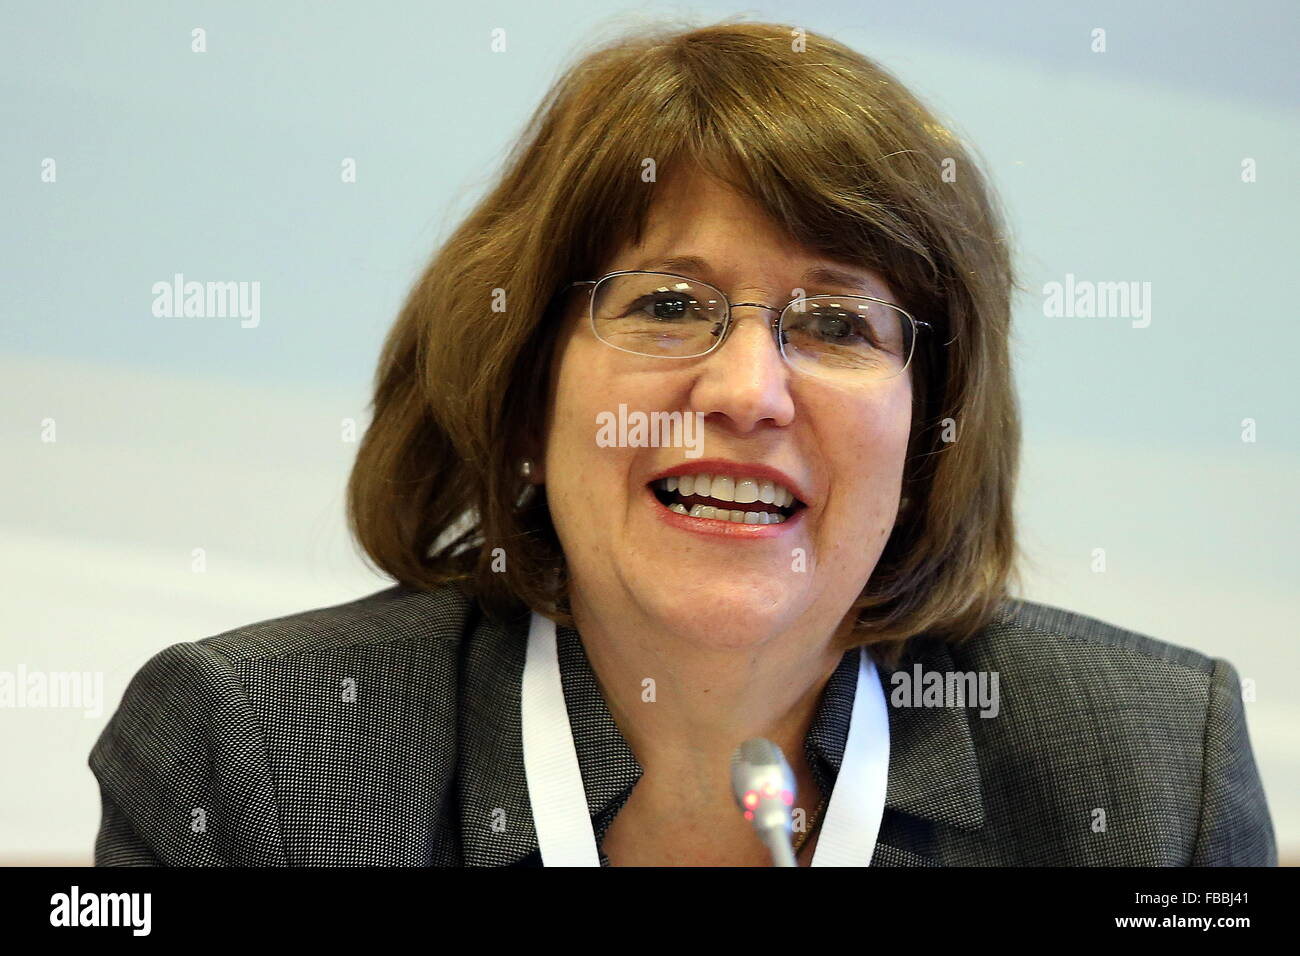 Moscow, Russia. 14th Jan, 2016. Associate professor at Columbia Unversity, Cynthia Roberts at the 2016 Gaidar Forum, - Stock Image